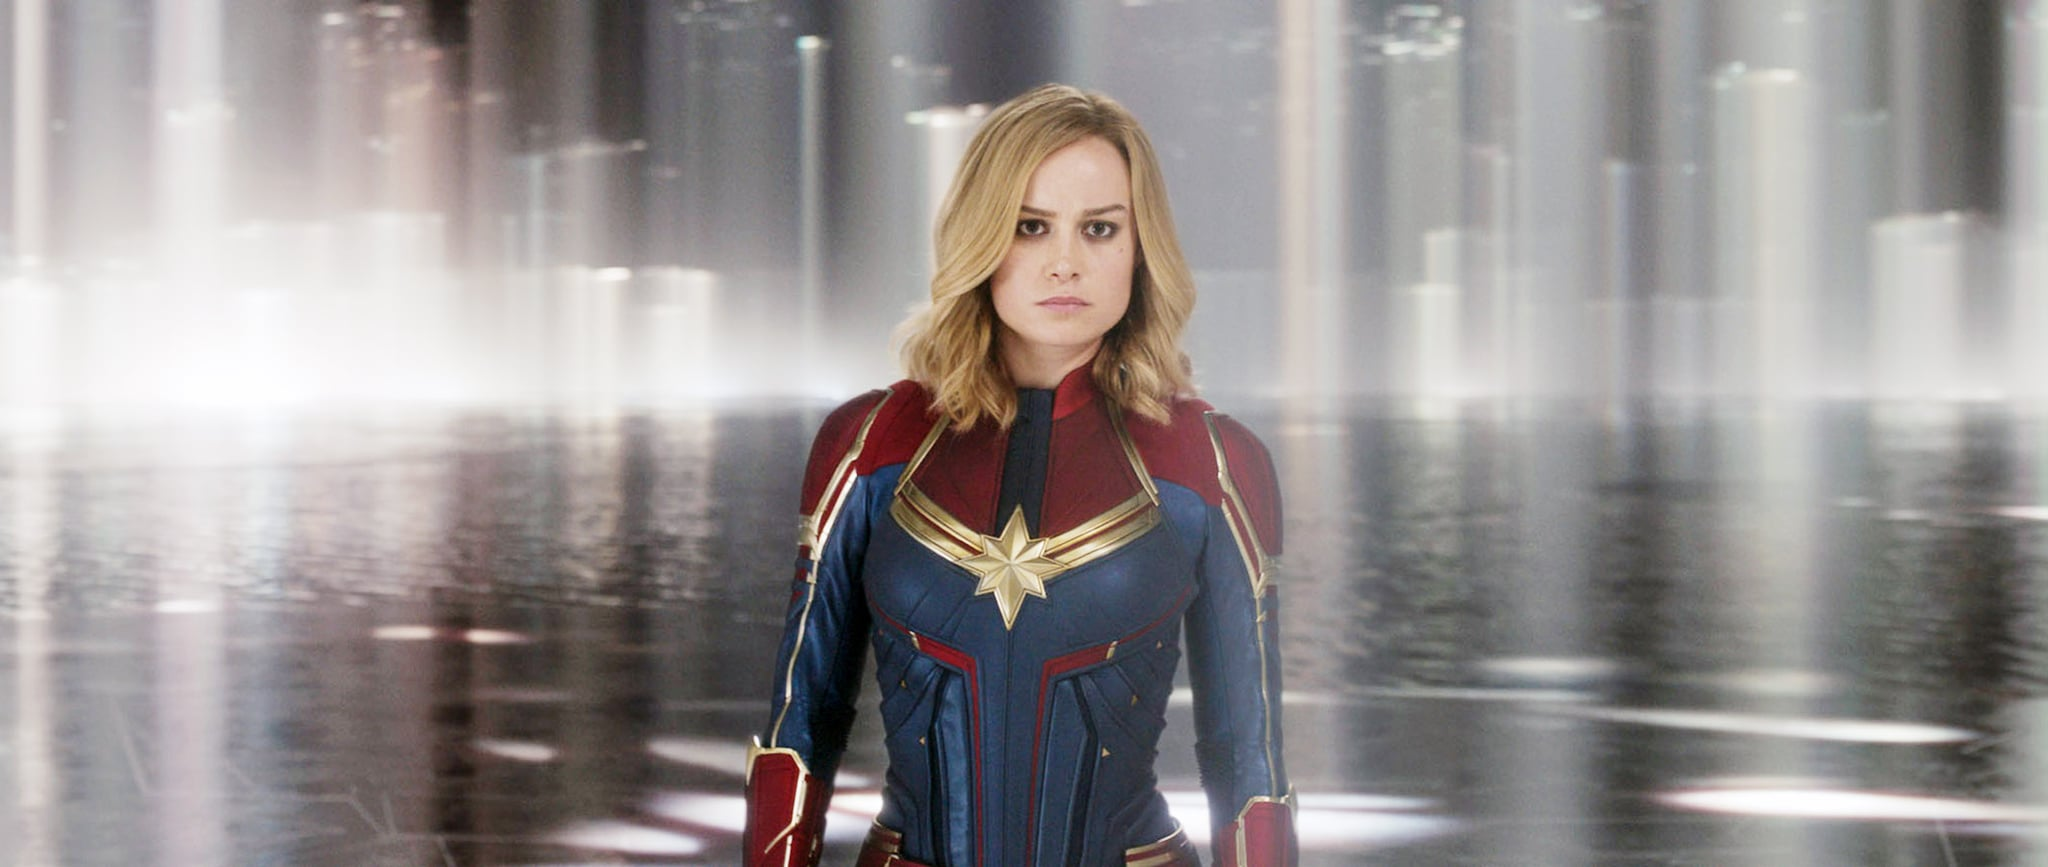 CAPTAIN MARVEL, Brie Larson as Carol Danvers / Captain Marvel, 2019.  Walt Disney Studios Motion Pictures /  Marvel / courtesy Everett Collection